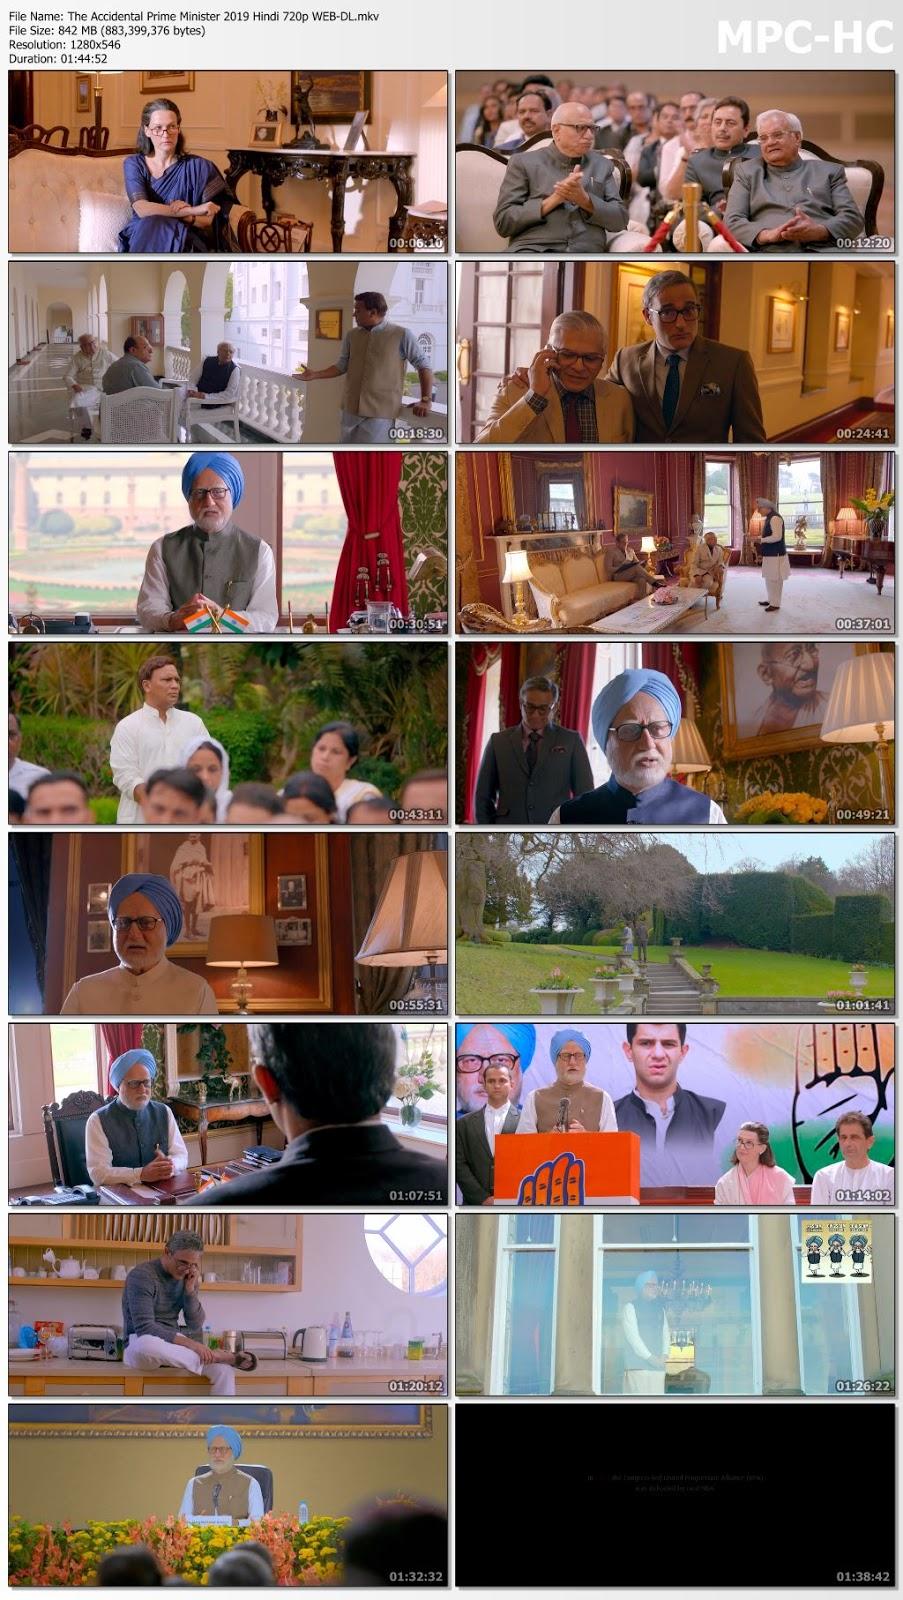 The Accidental Prime Minister 2019 Hindi 720p WEB-DL 800MB Desirehub